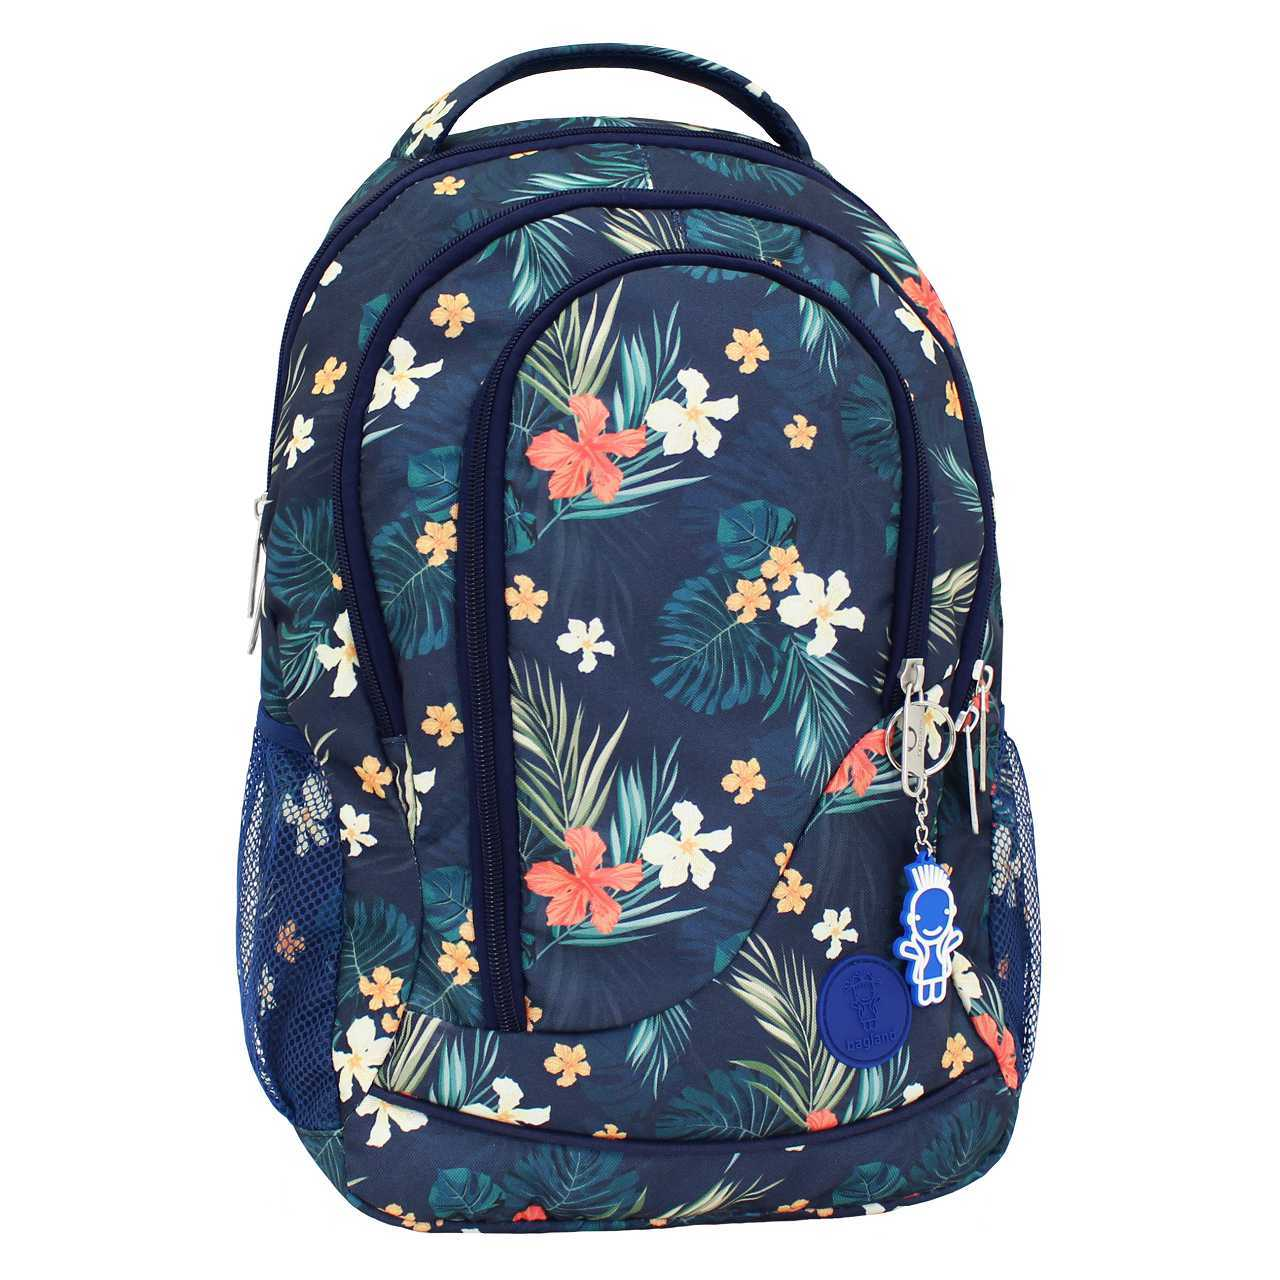 Рюкзак Бис цветы 556664